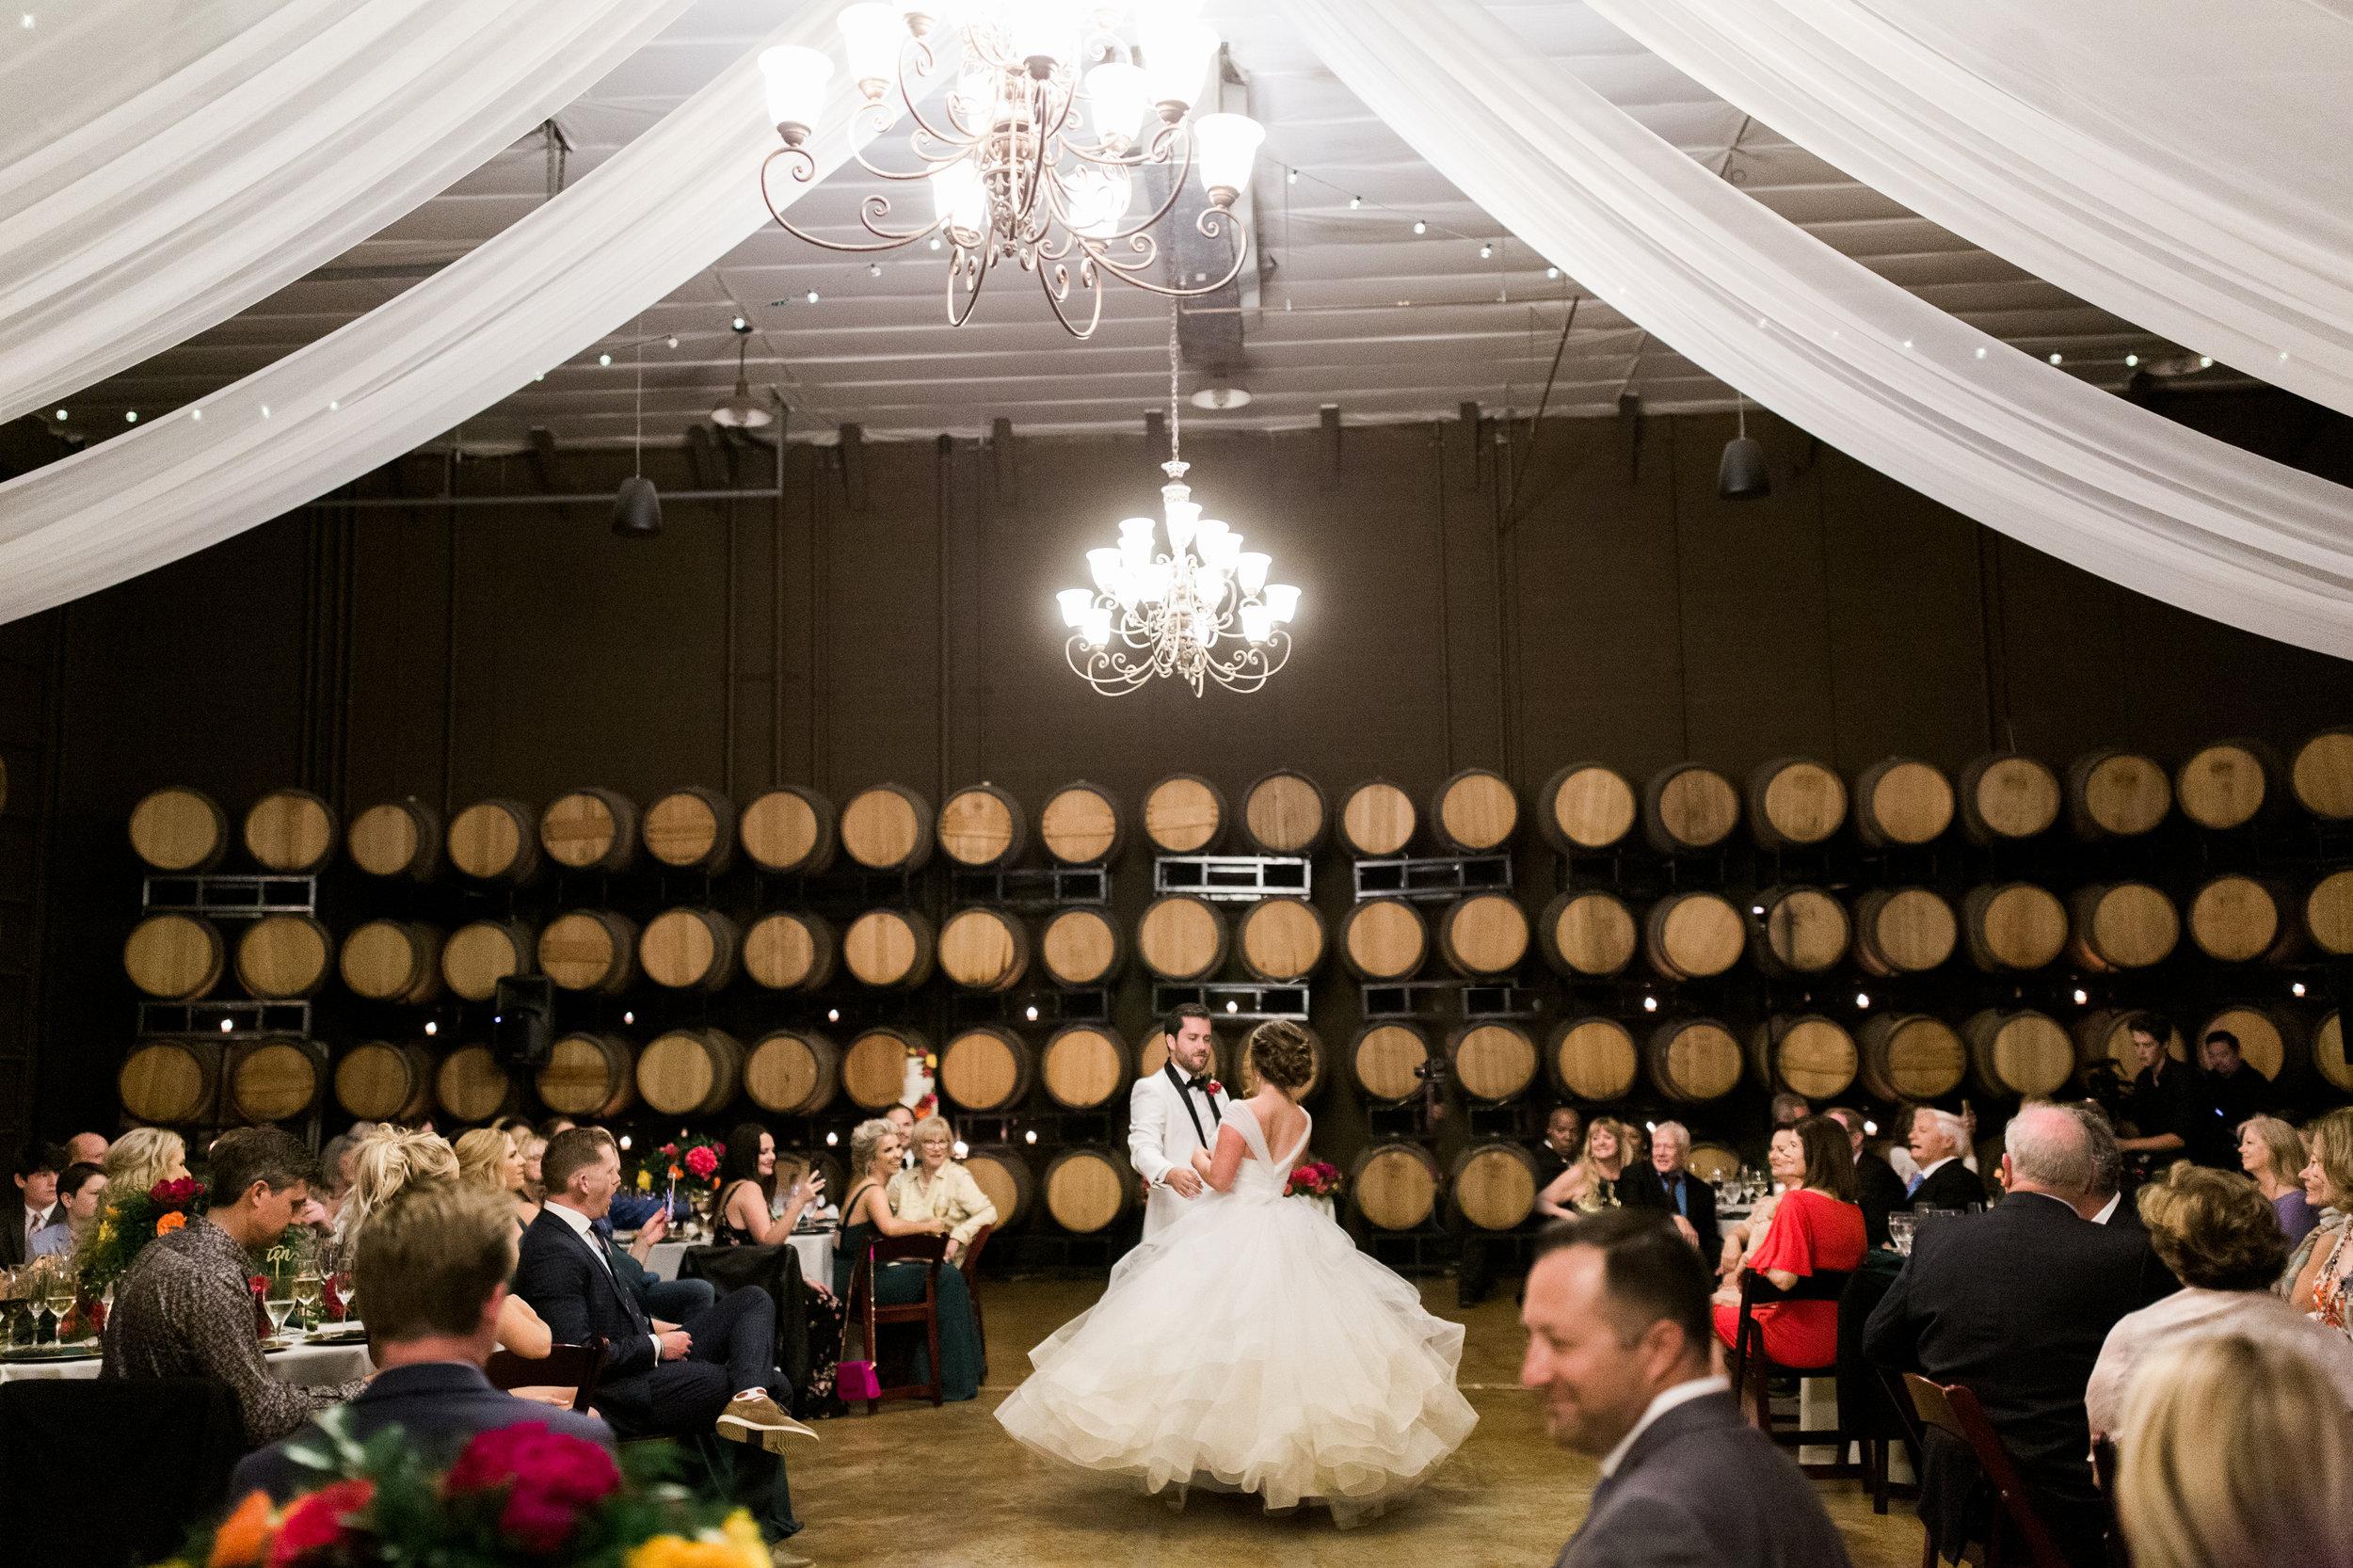 Leoness Cellars Winery Wedding Photographer Leah Vis  (5).jpg